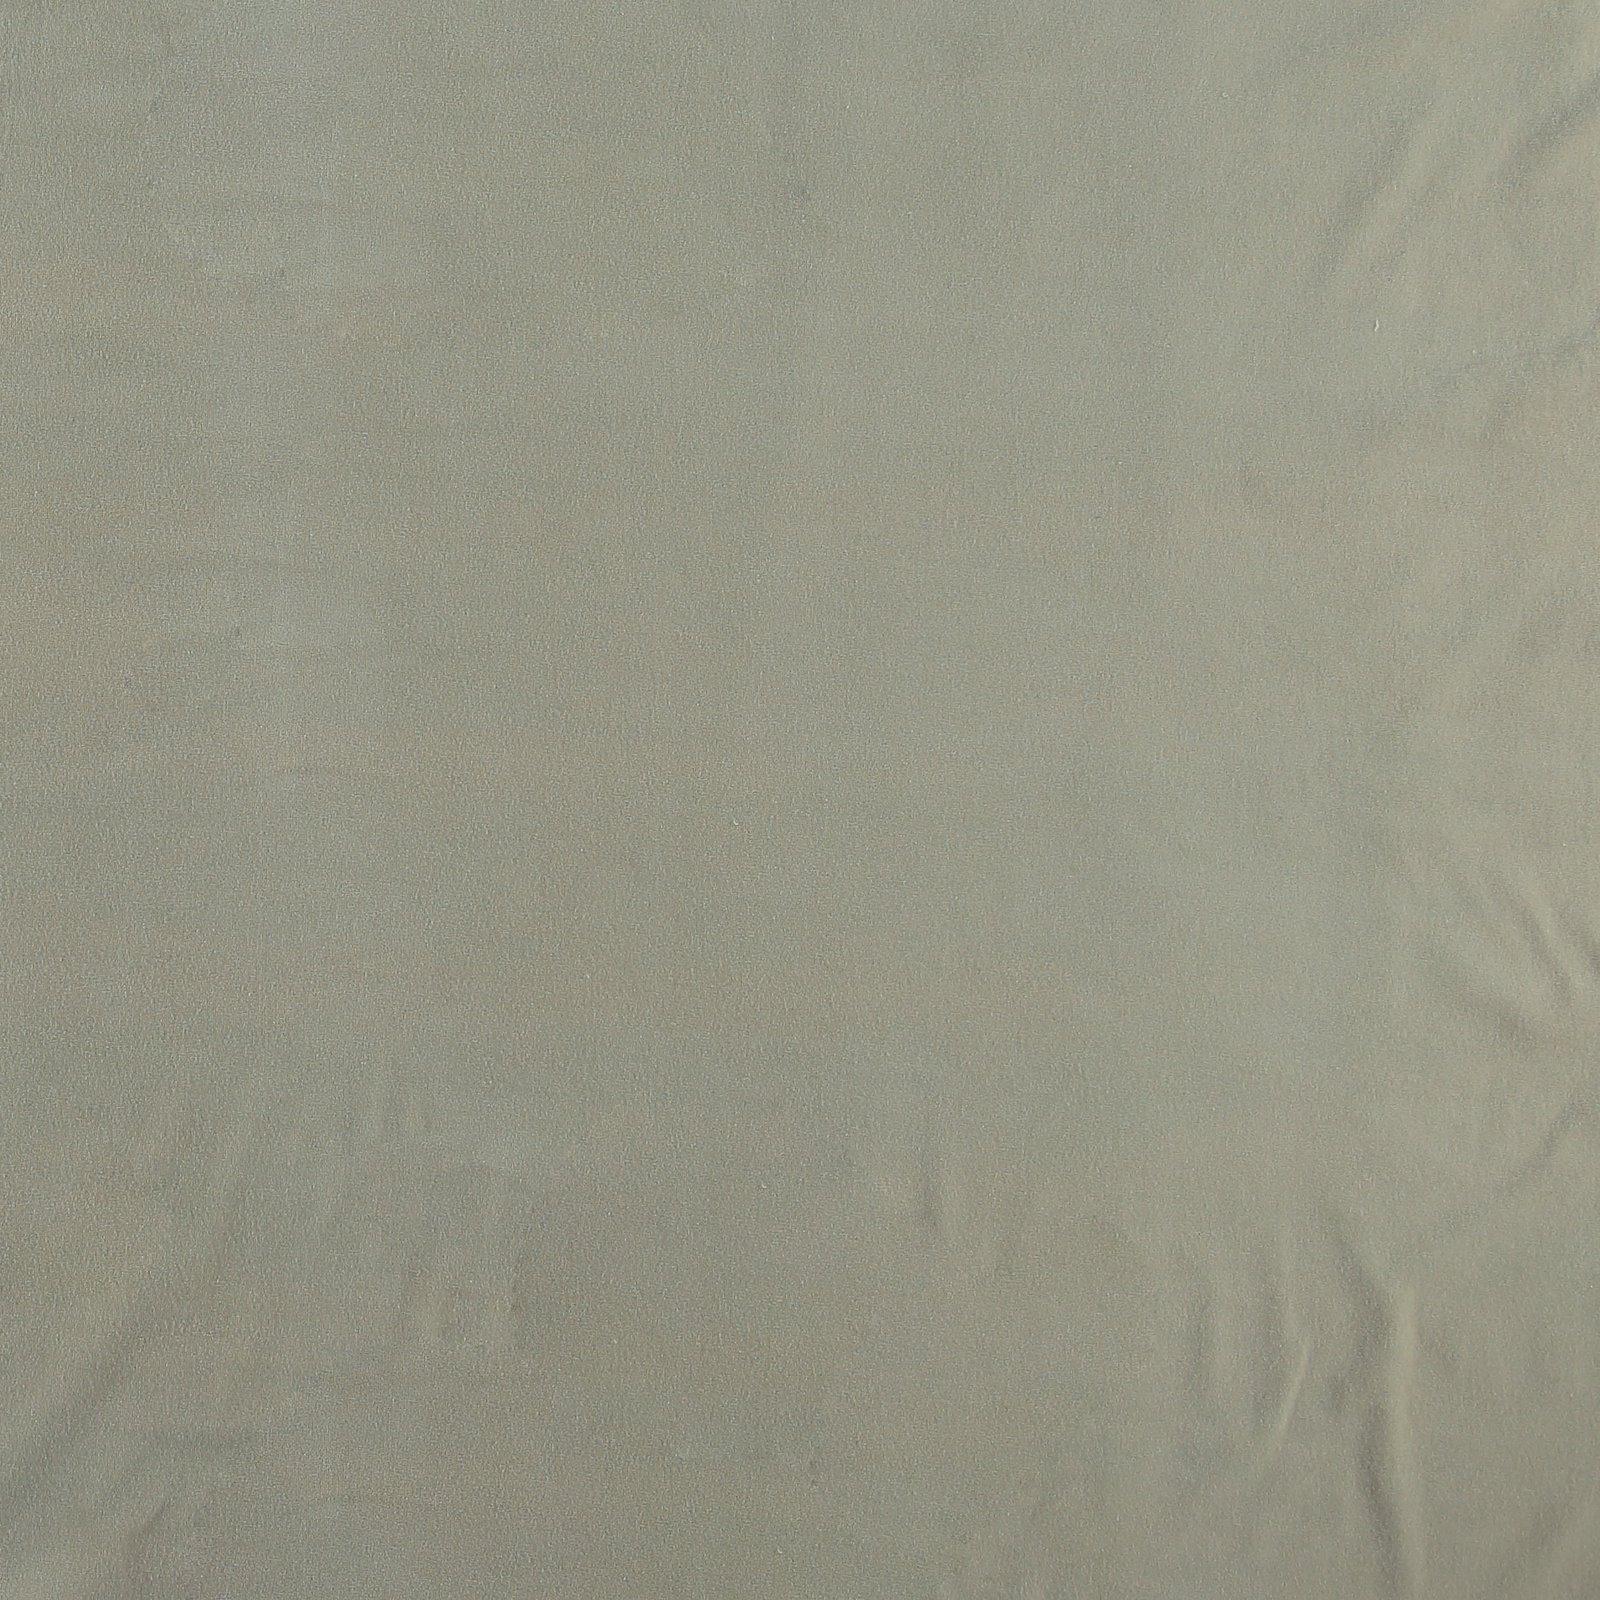 Organic stretch velvet sand 250750_pack_solid